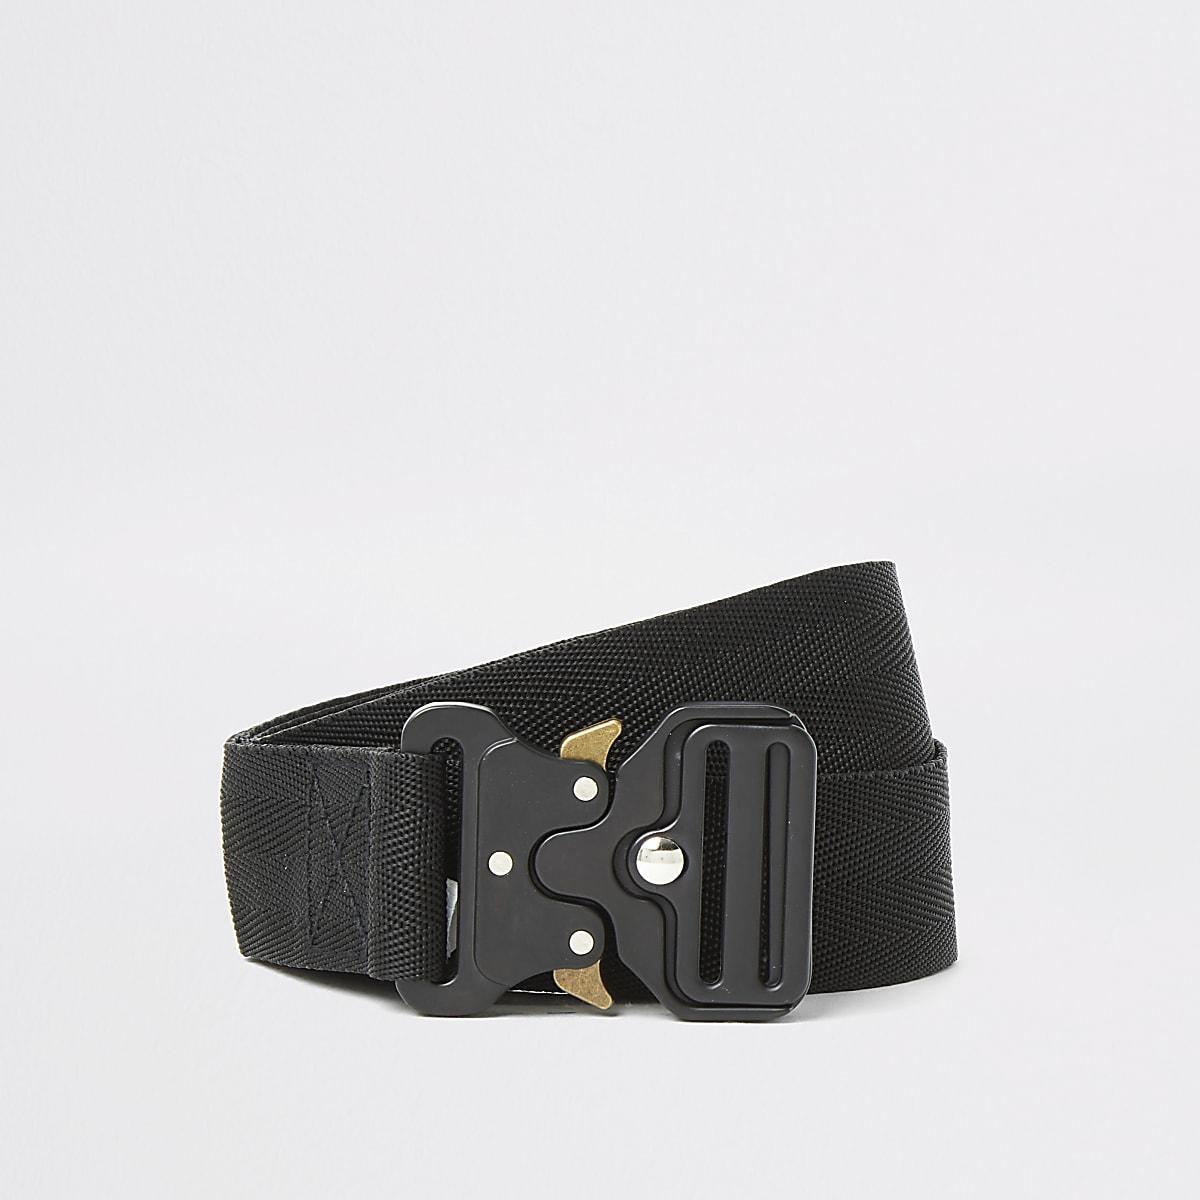 new cheap best service online retailer Black clip buckle belt